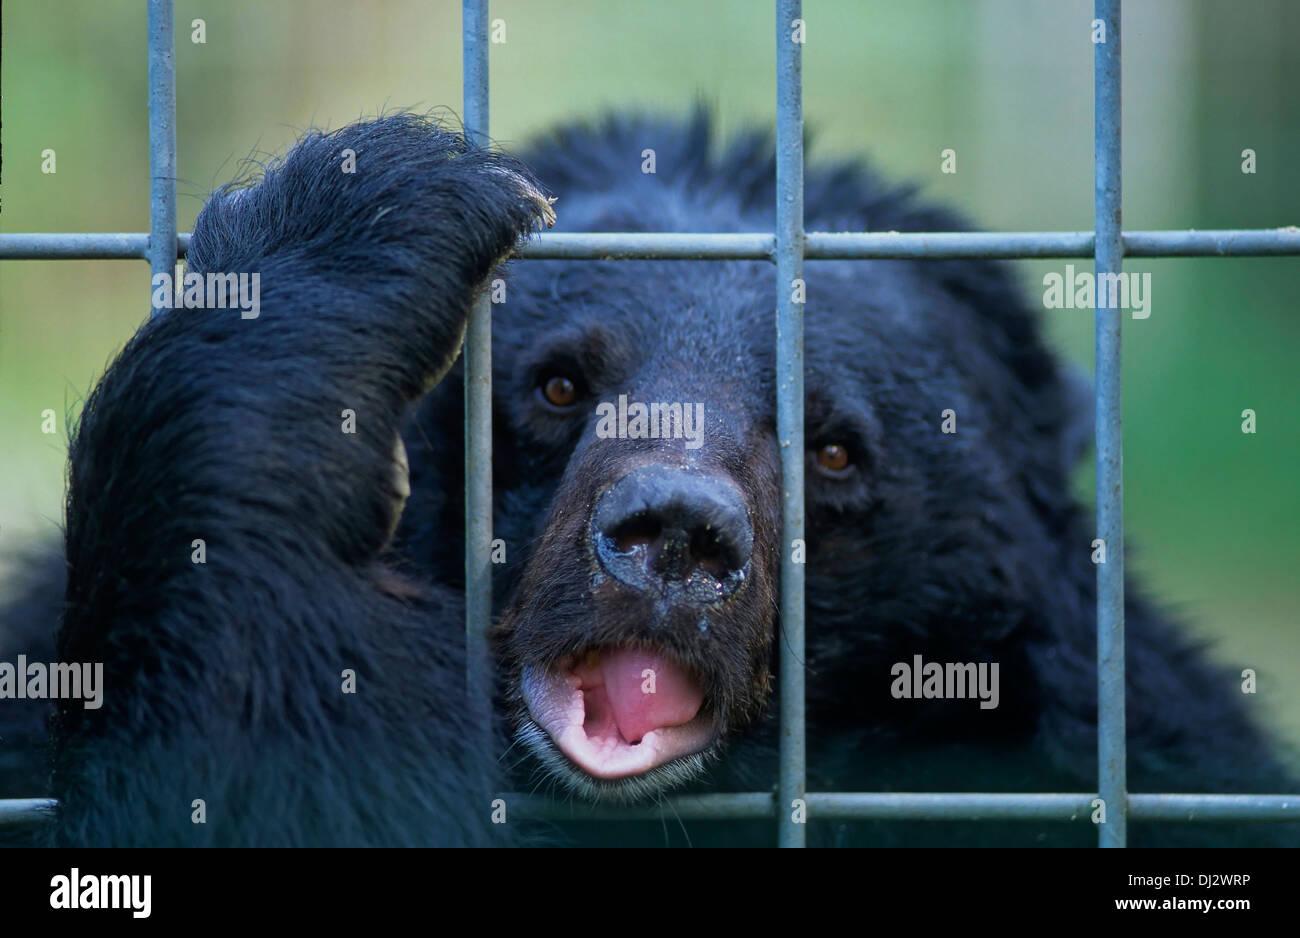 Asian black bear (Ursus thibetanus), moon bear, bianco-chested orso, Zoo: Kragenbär hinter Gitter, Kragenbär, Asiatischer Schwarz Immagini Stock